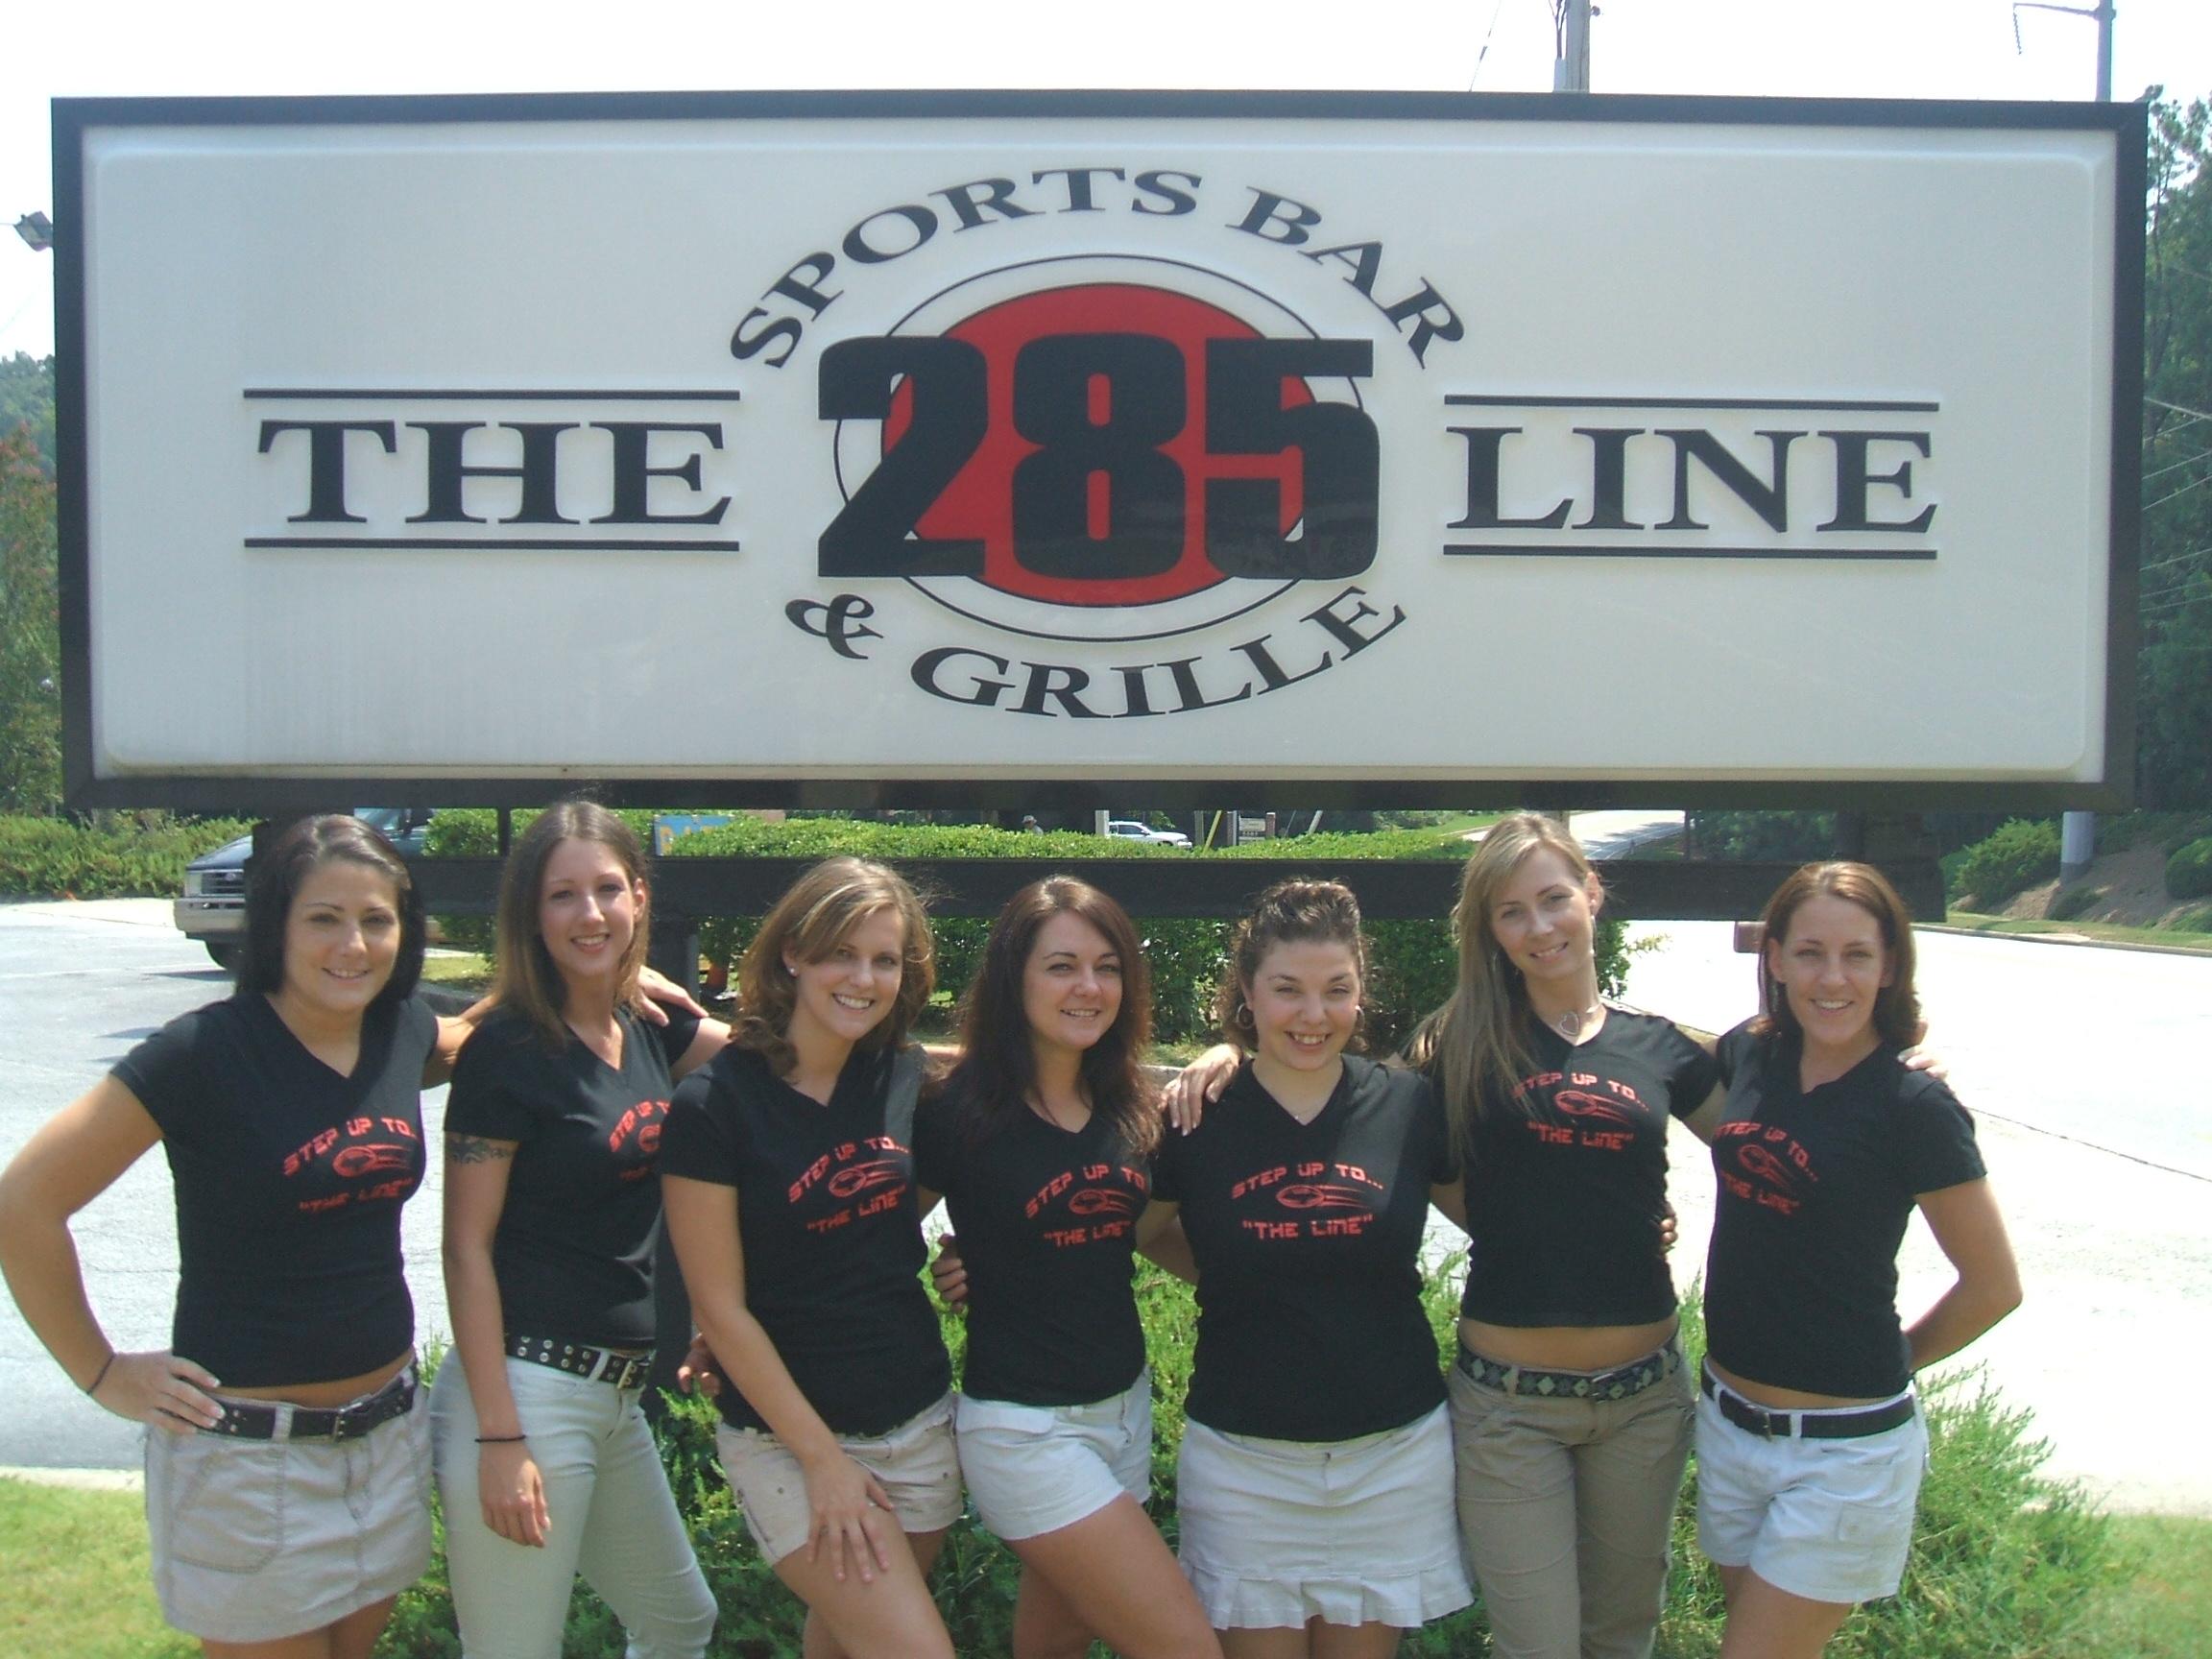 Custom T Shirts For The Line 285 Girls Love Custom Ink Shirt